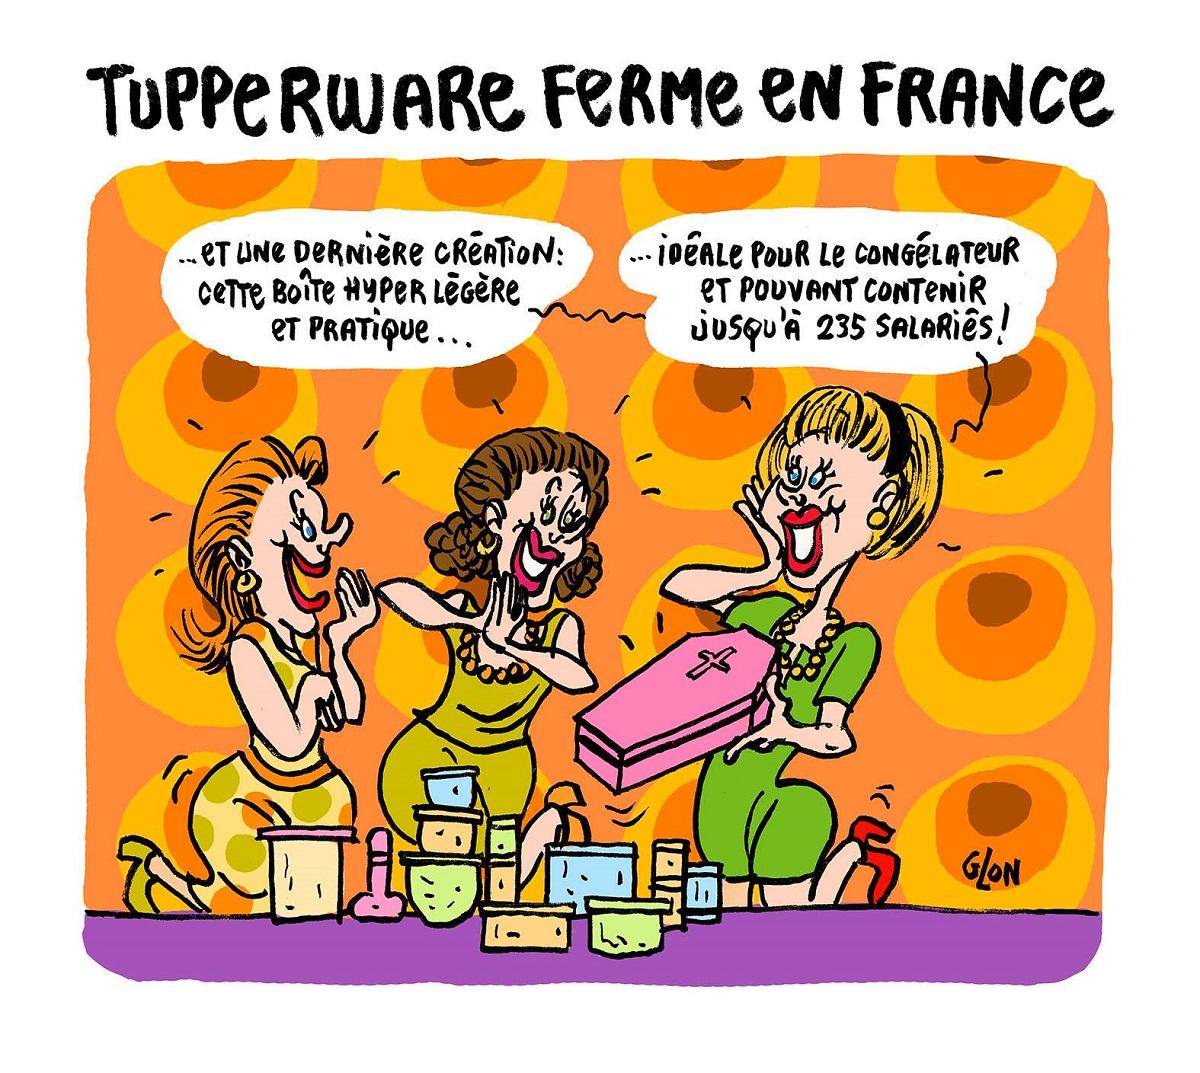 dessin humoristique d'une réunion Tupperware